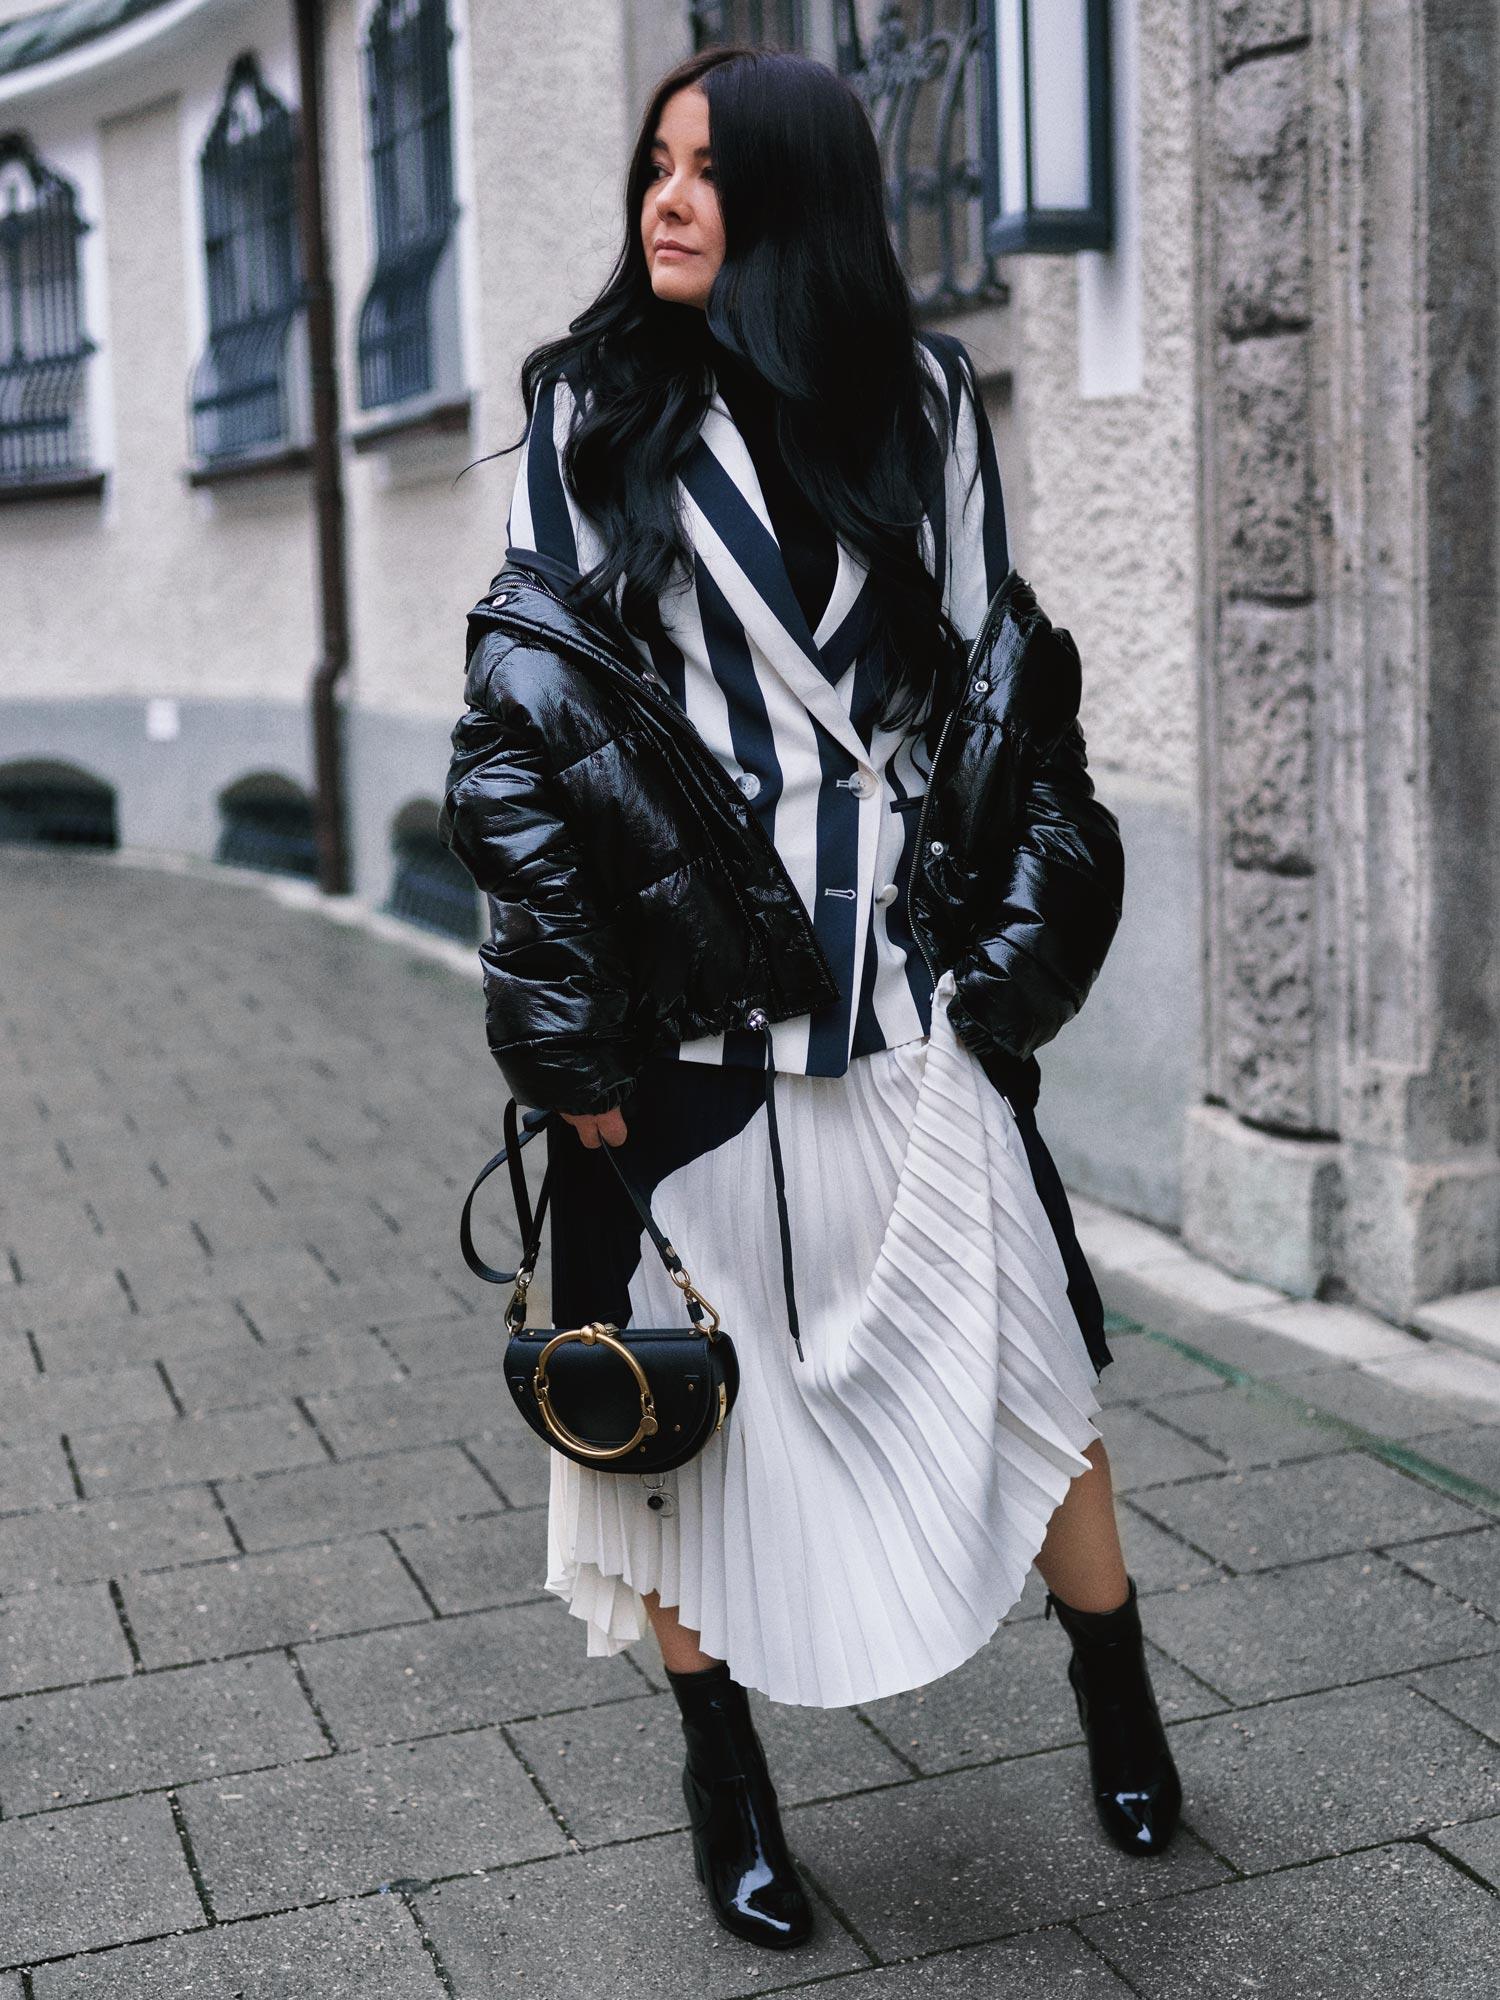 fashion-blogger-aus-muenchen-fashionblogger-lifestyleblogger-beautyblogger-fashion-blogger-modeblogger-modeblog-munich-blog-muenchen-streifen-trend-fashion-week